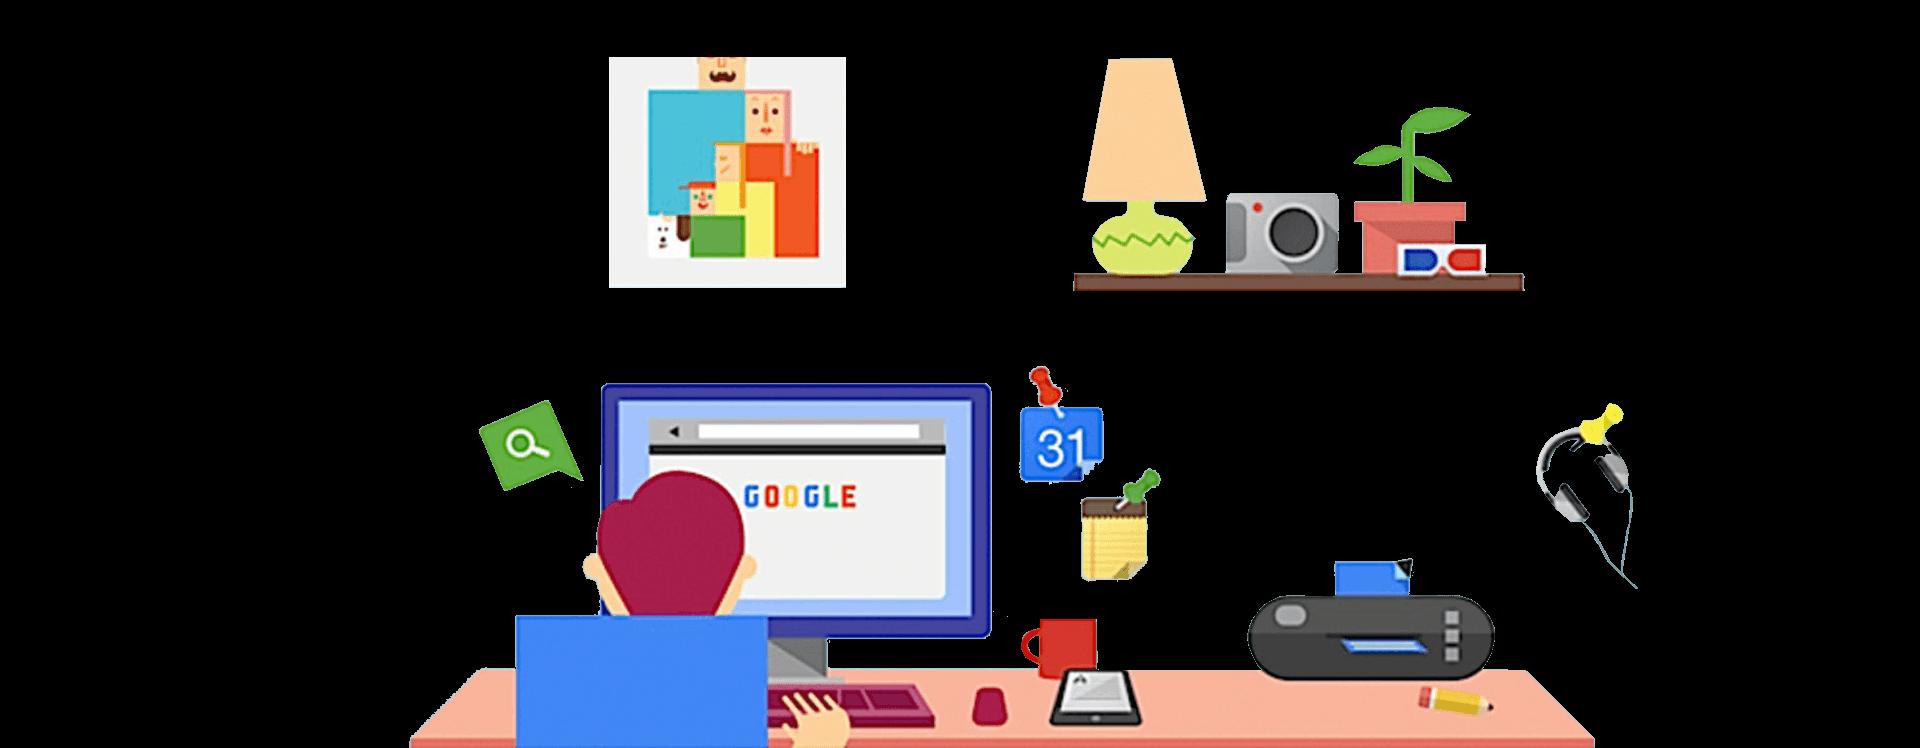 ankara web tasarım Google